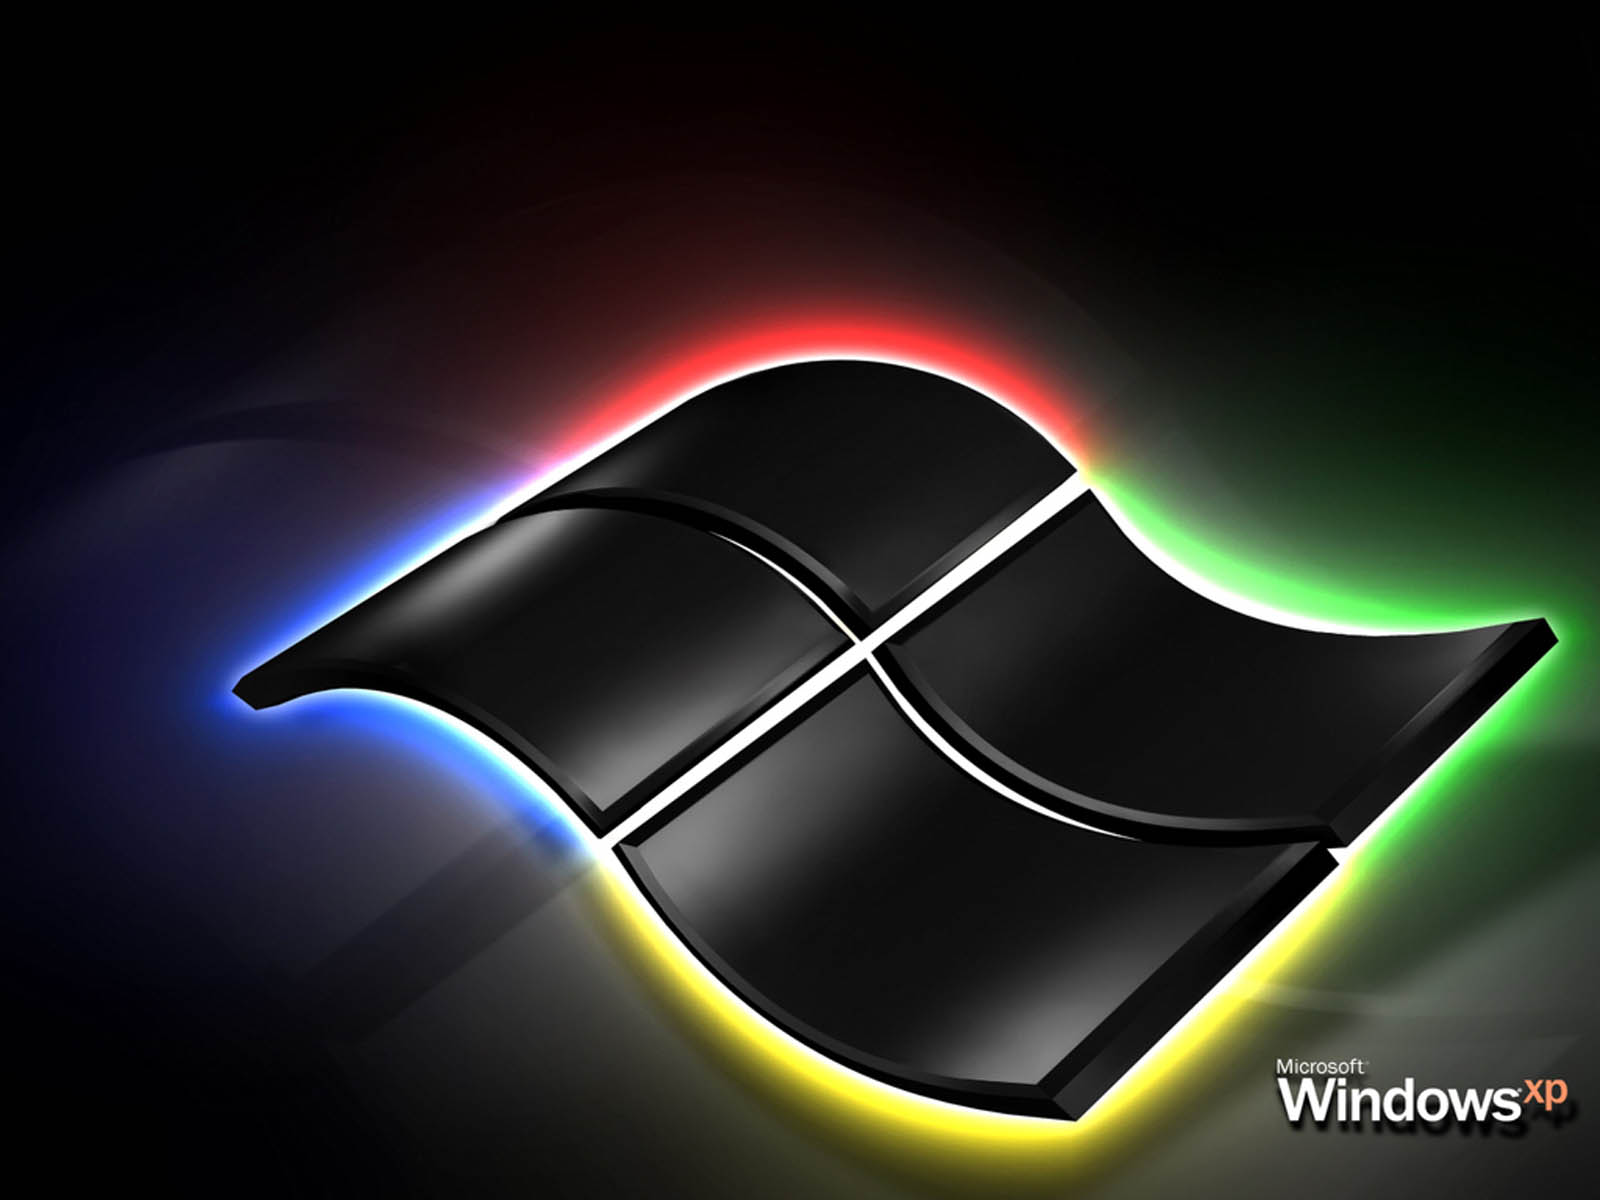 XP Wallpapers Windows XP Desktop Wallpapers Windows XP Desktop 1600x1200